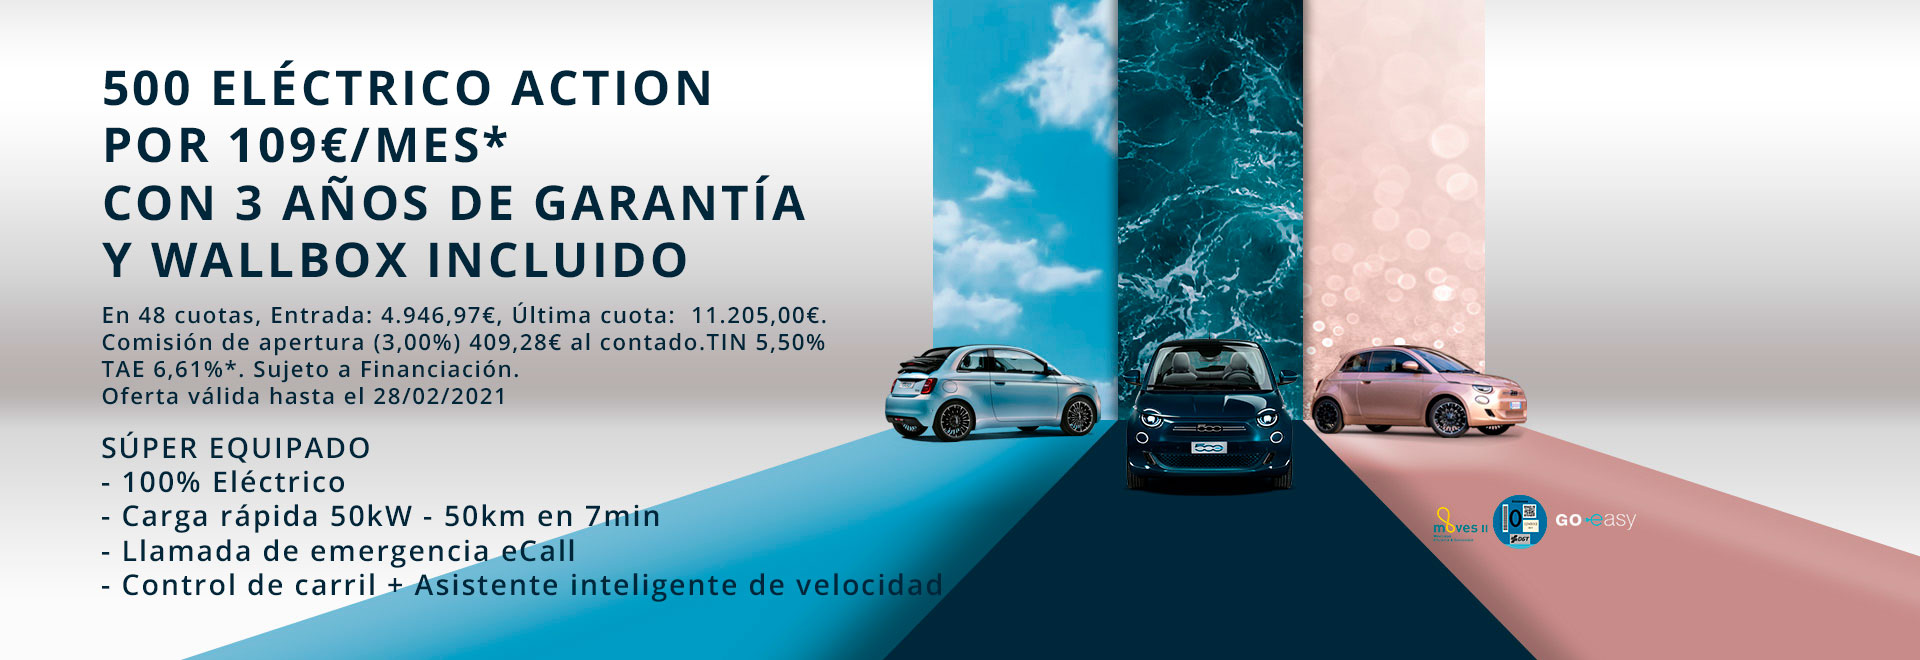 Oferta-500-ELÉCTRICO-ACTION-Vitoria